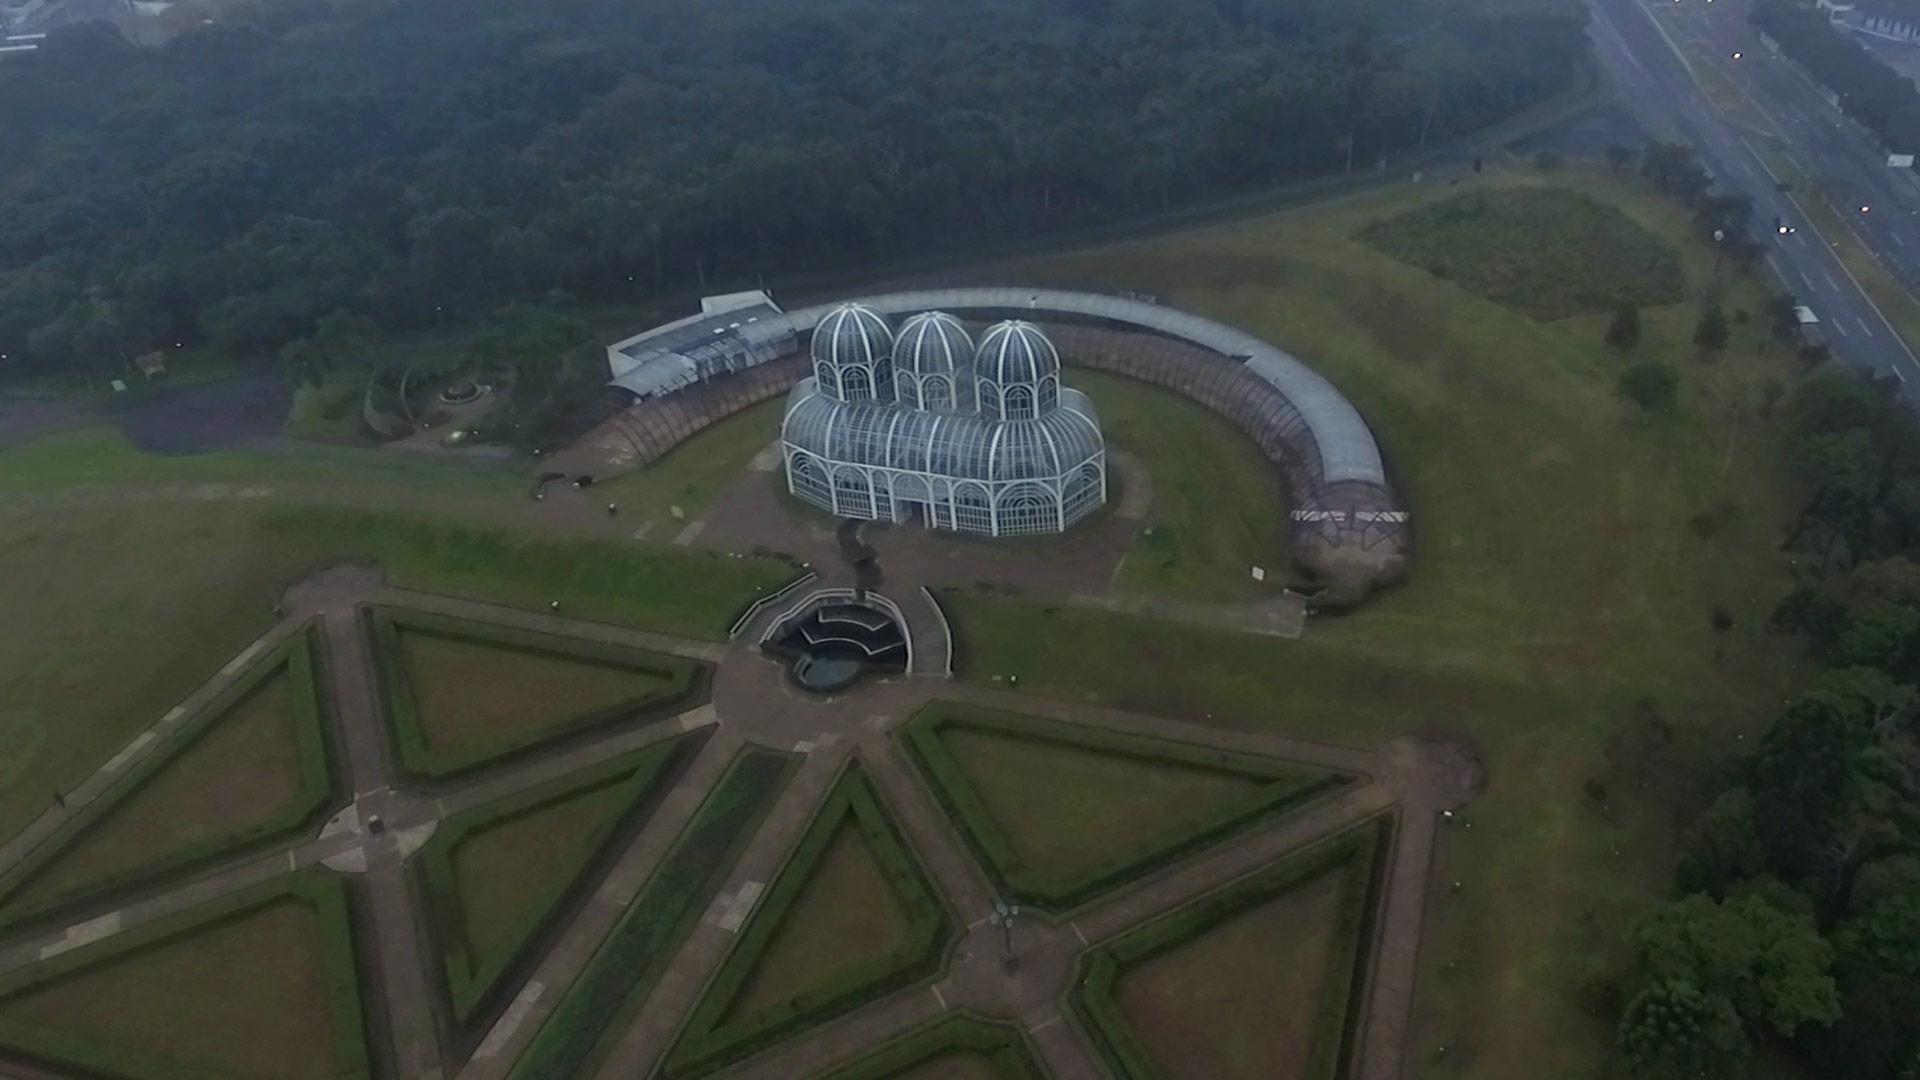 Fotografia Aerea Drone Jardim Botanico Curitiba